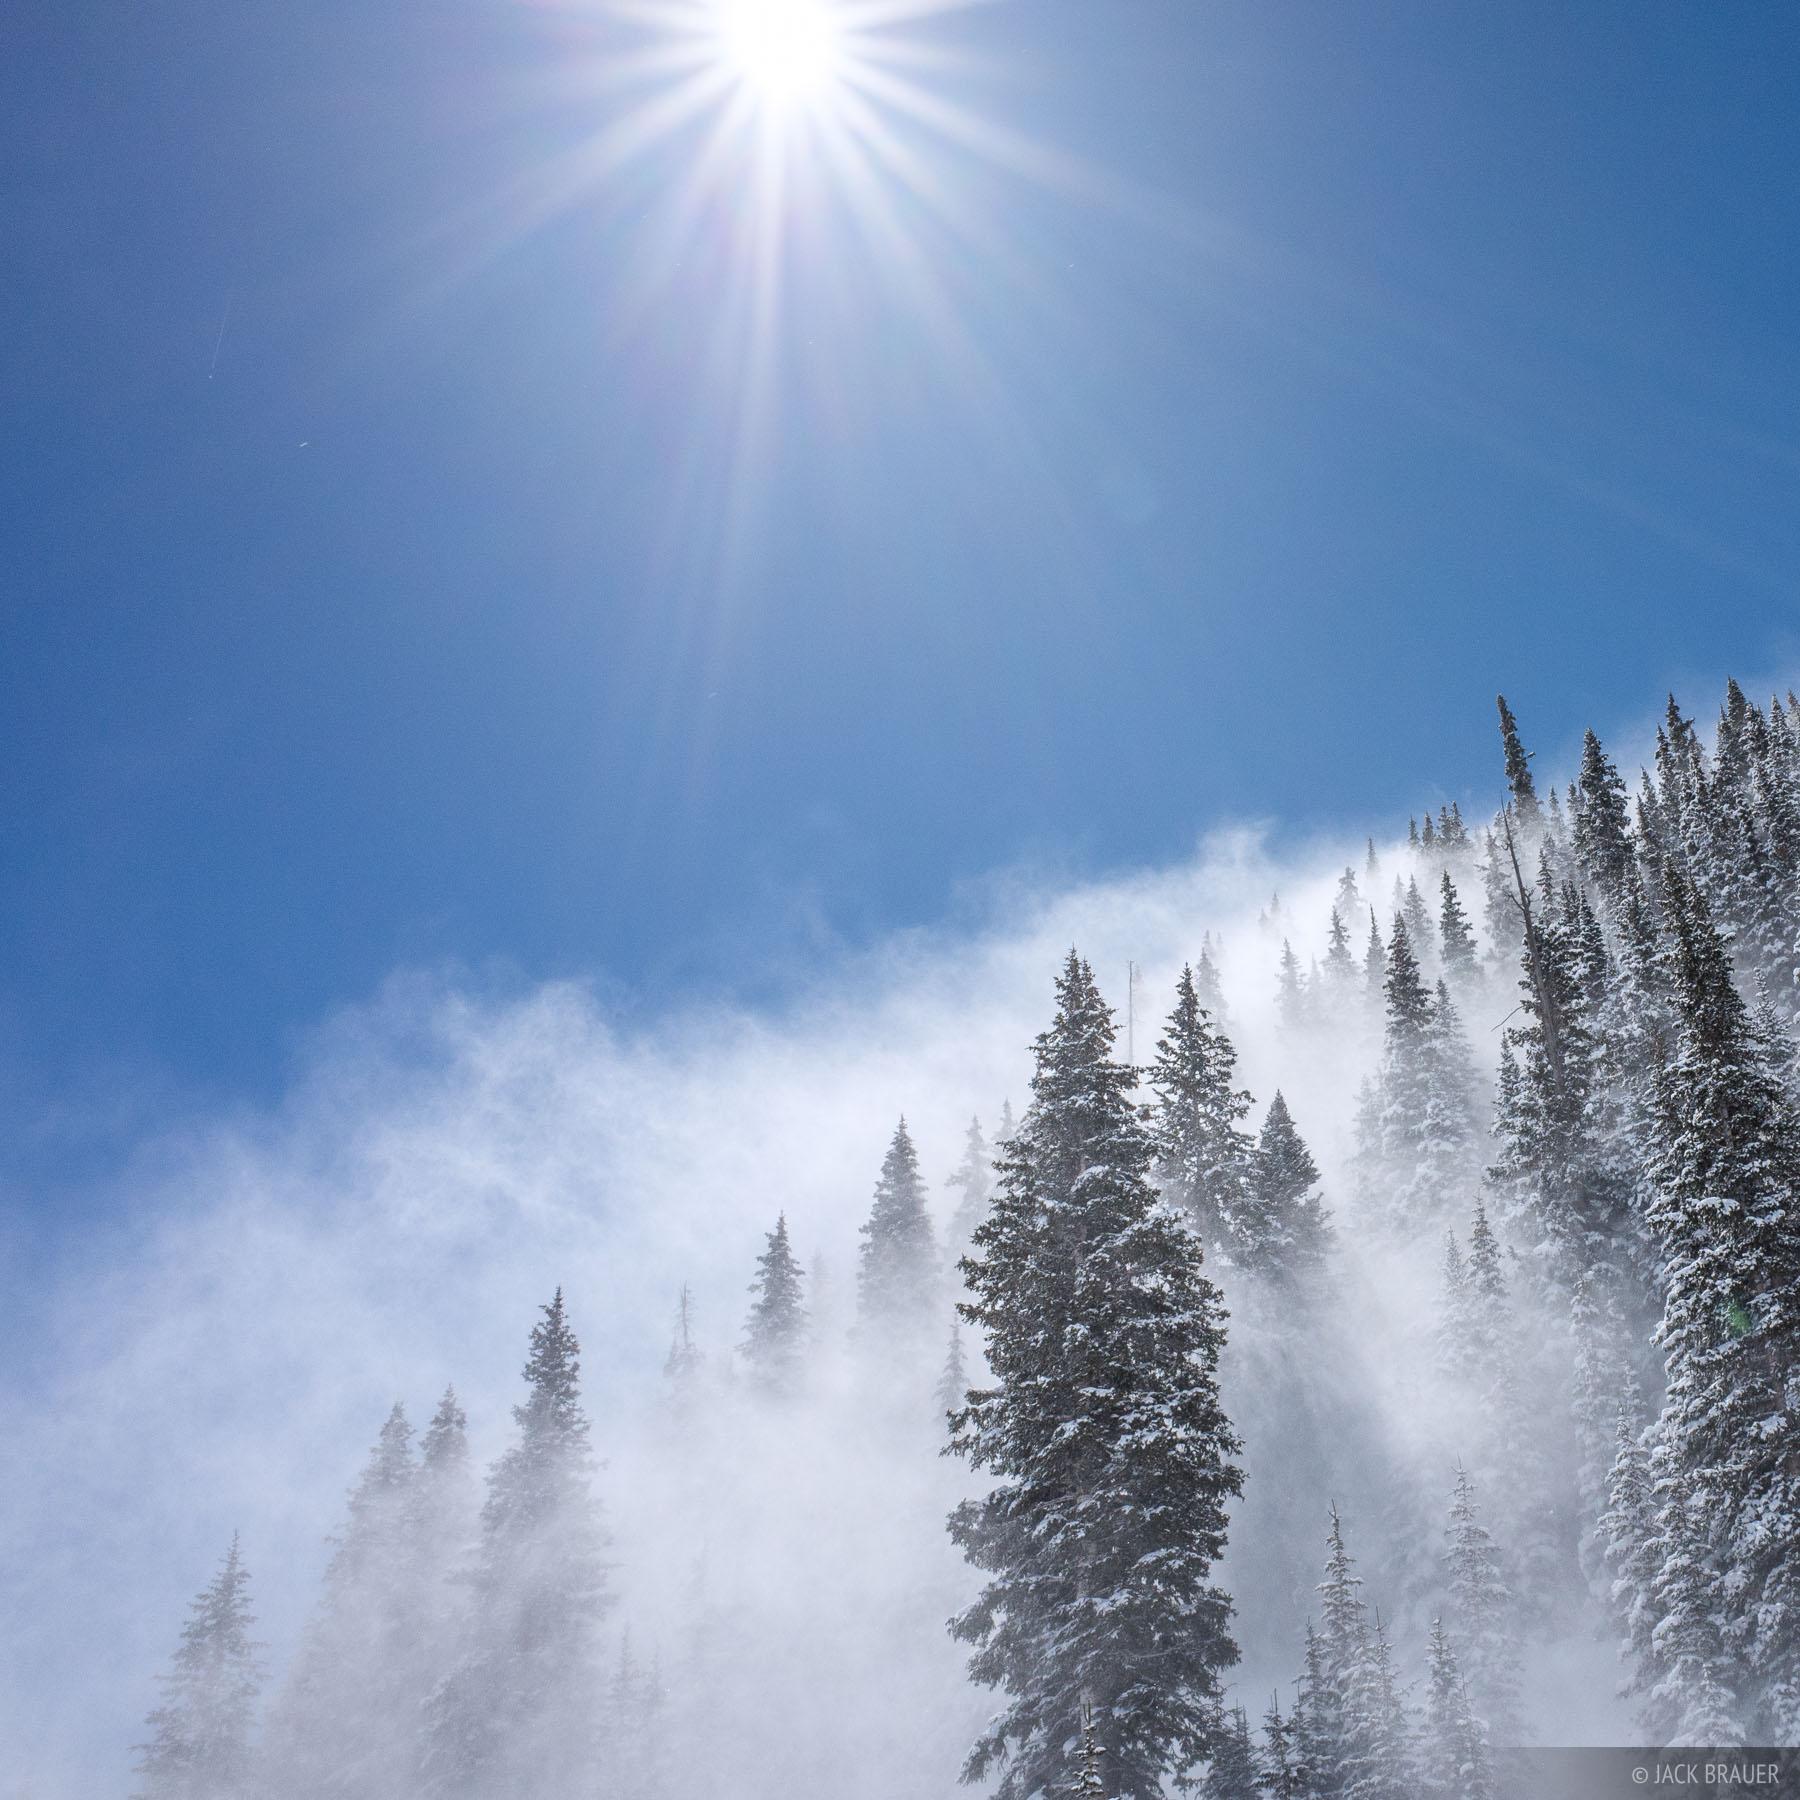 Colorado,Red Mountain Pass,San Juan Mountains, wind, snow, photo